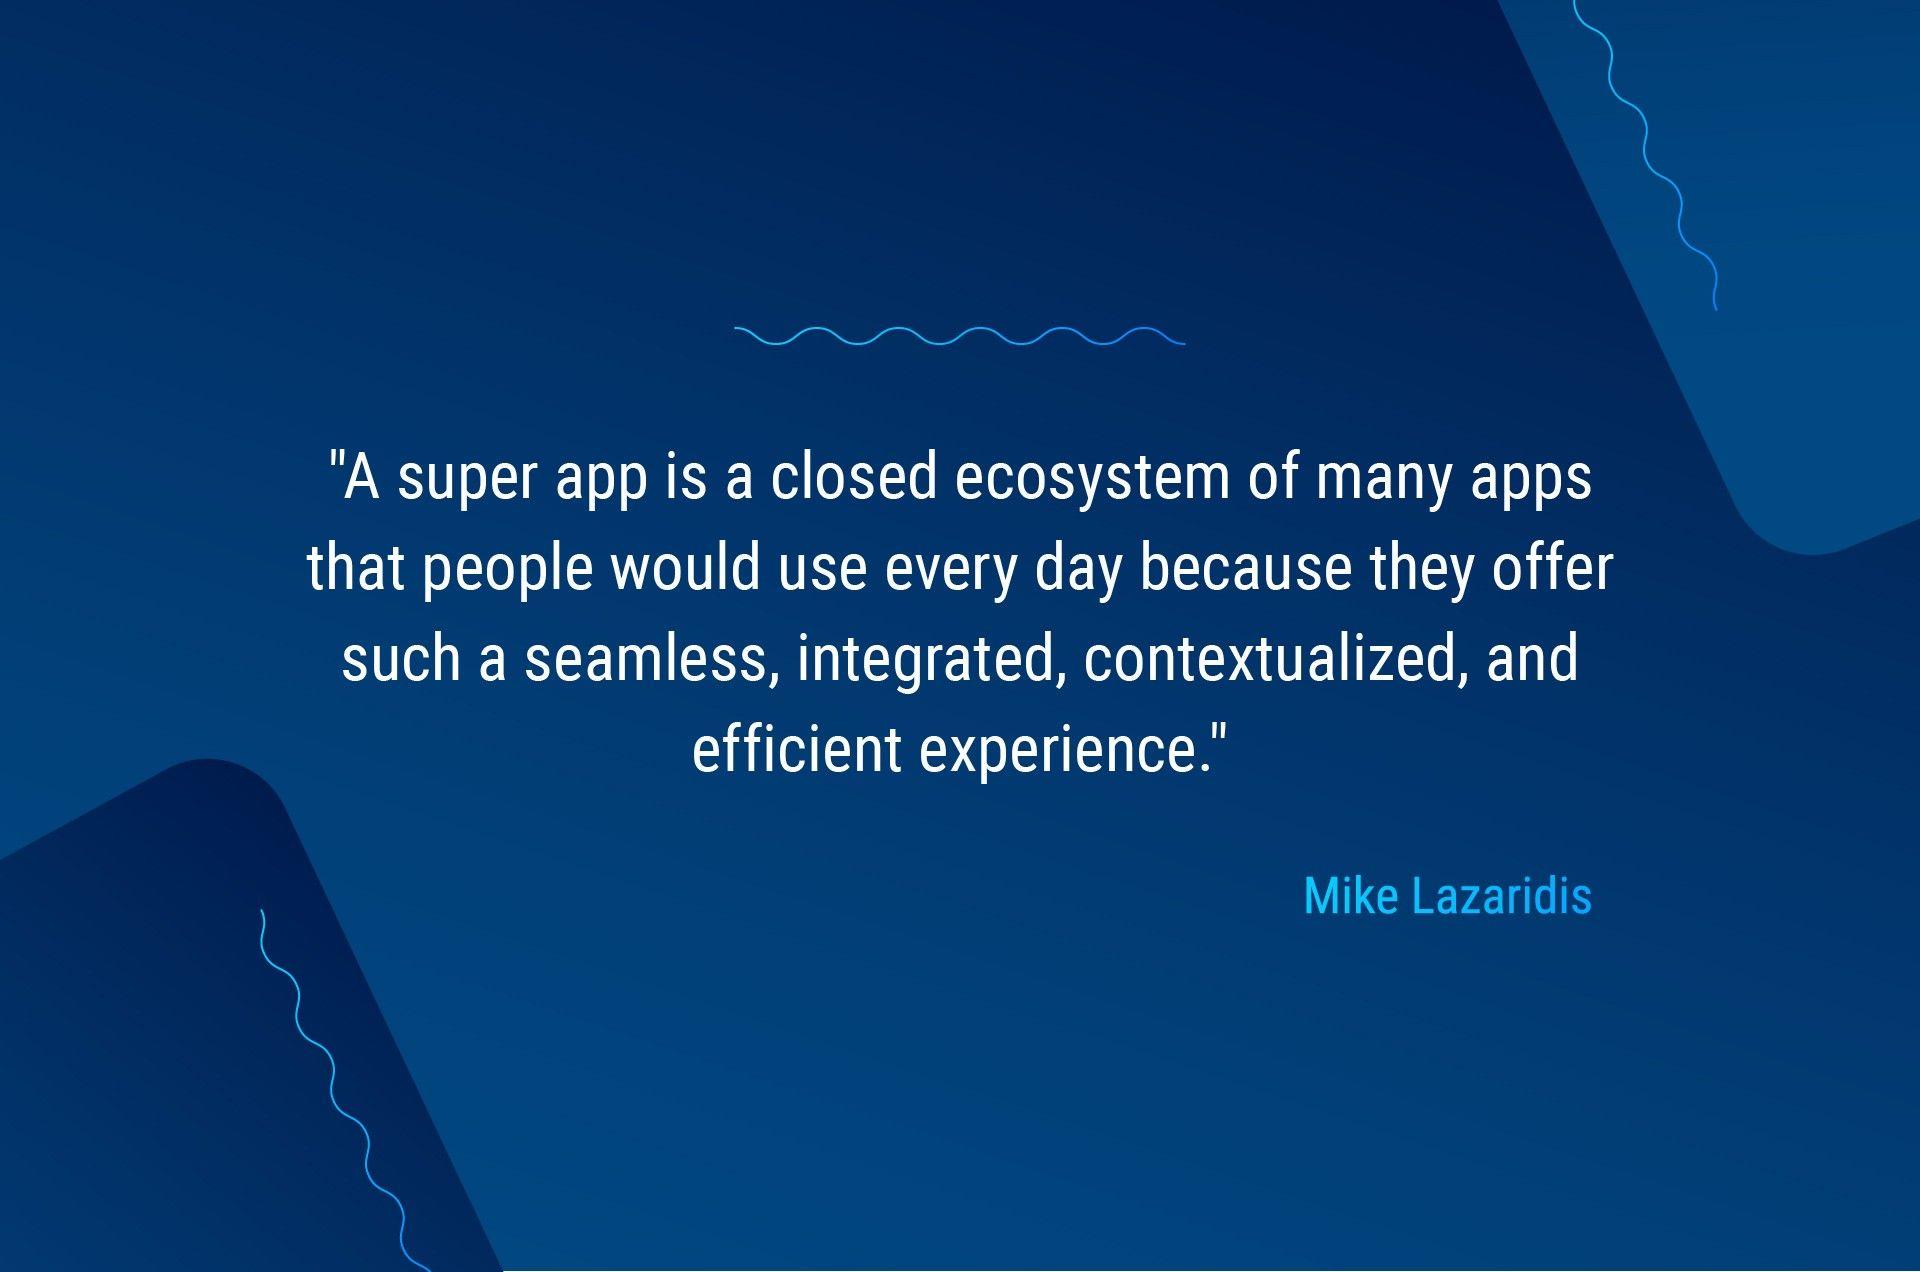 super app definition